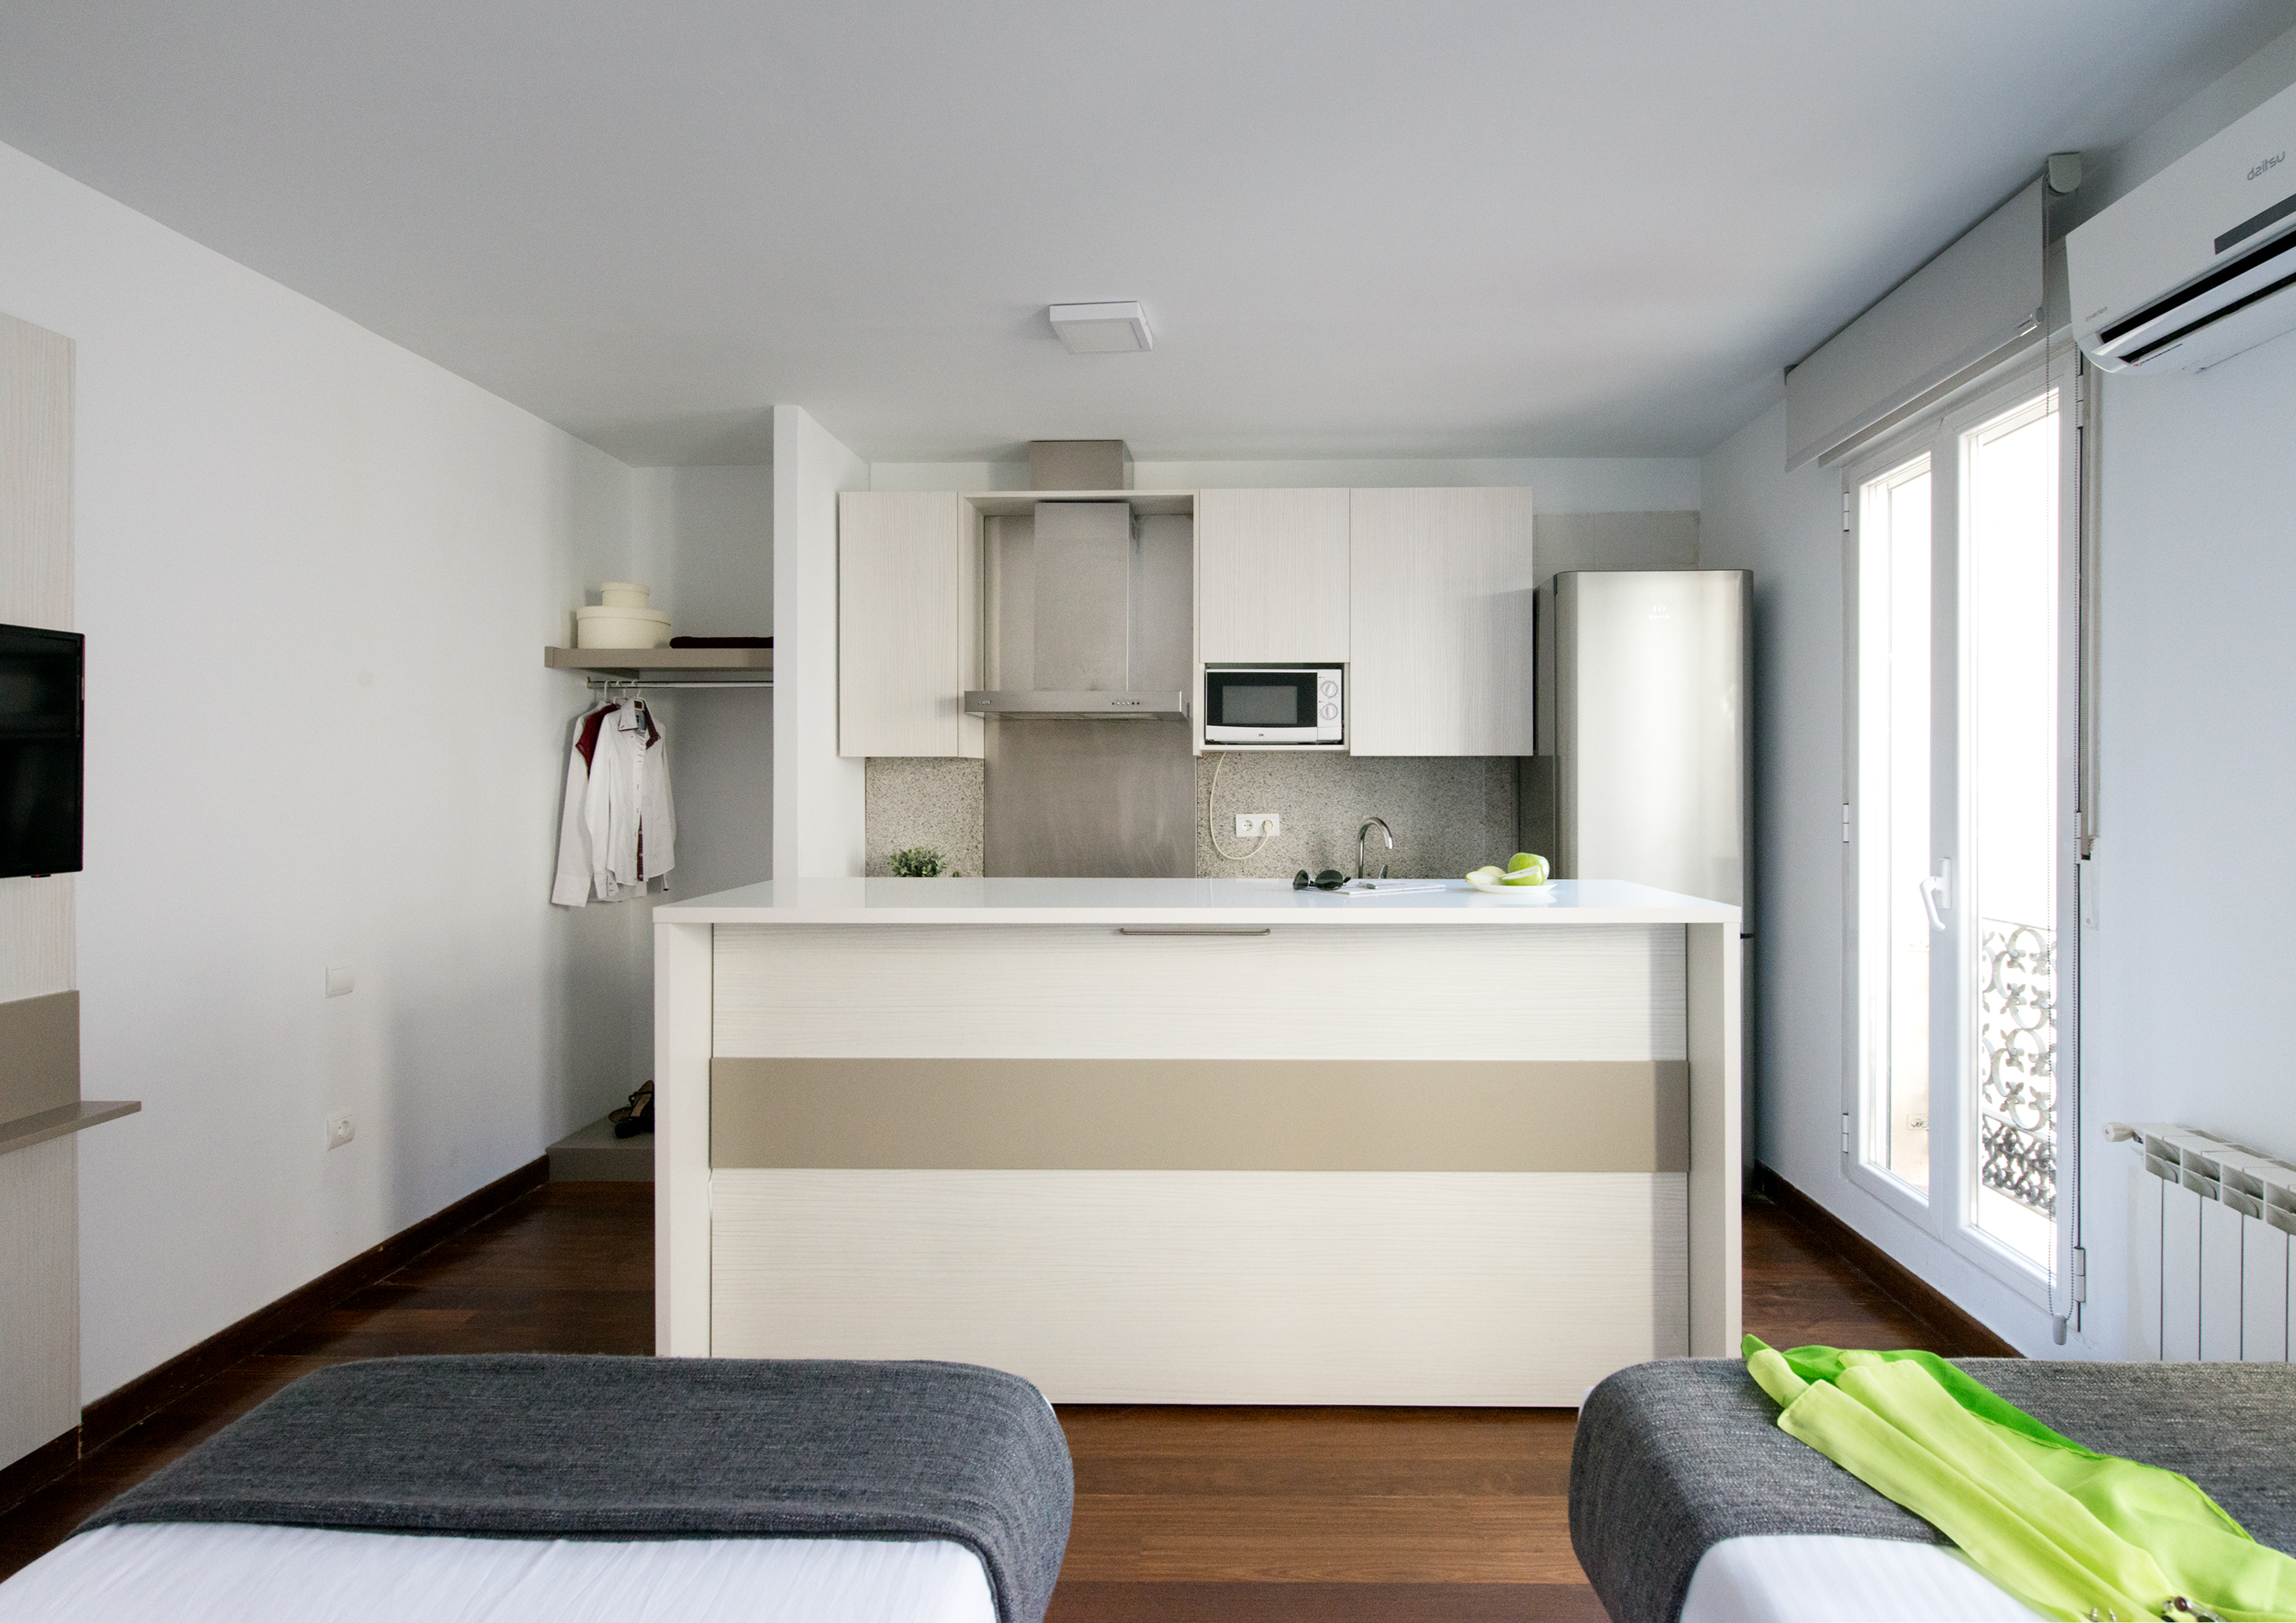 Centro apartamentos turisticos en madrid - Apartamento turistico madrid ...